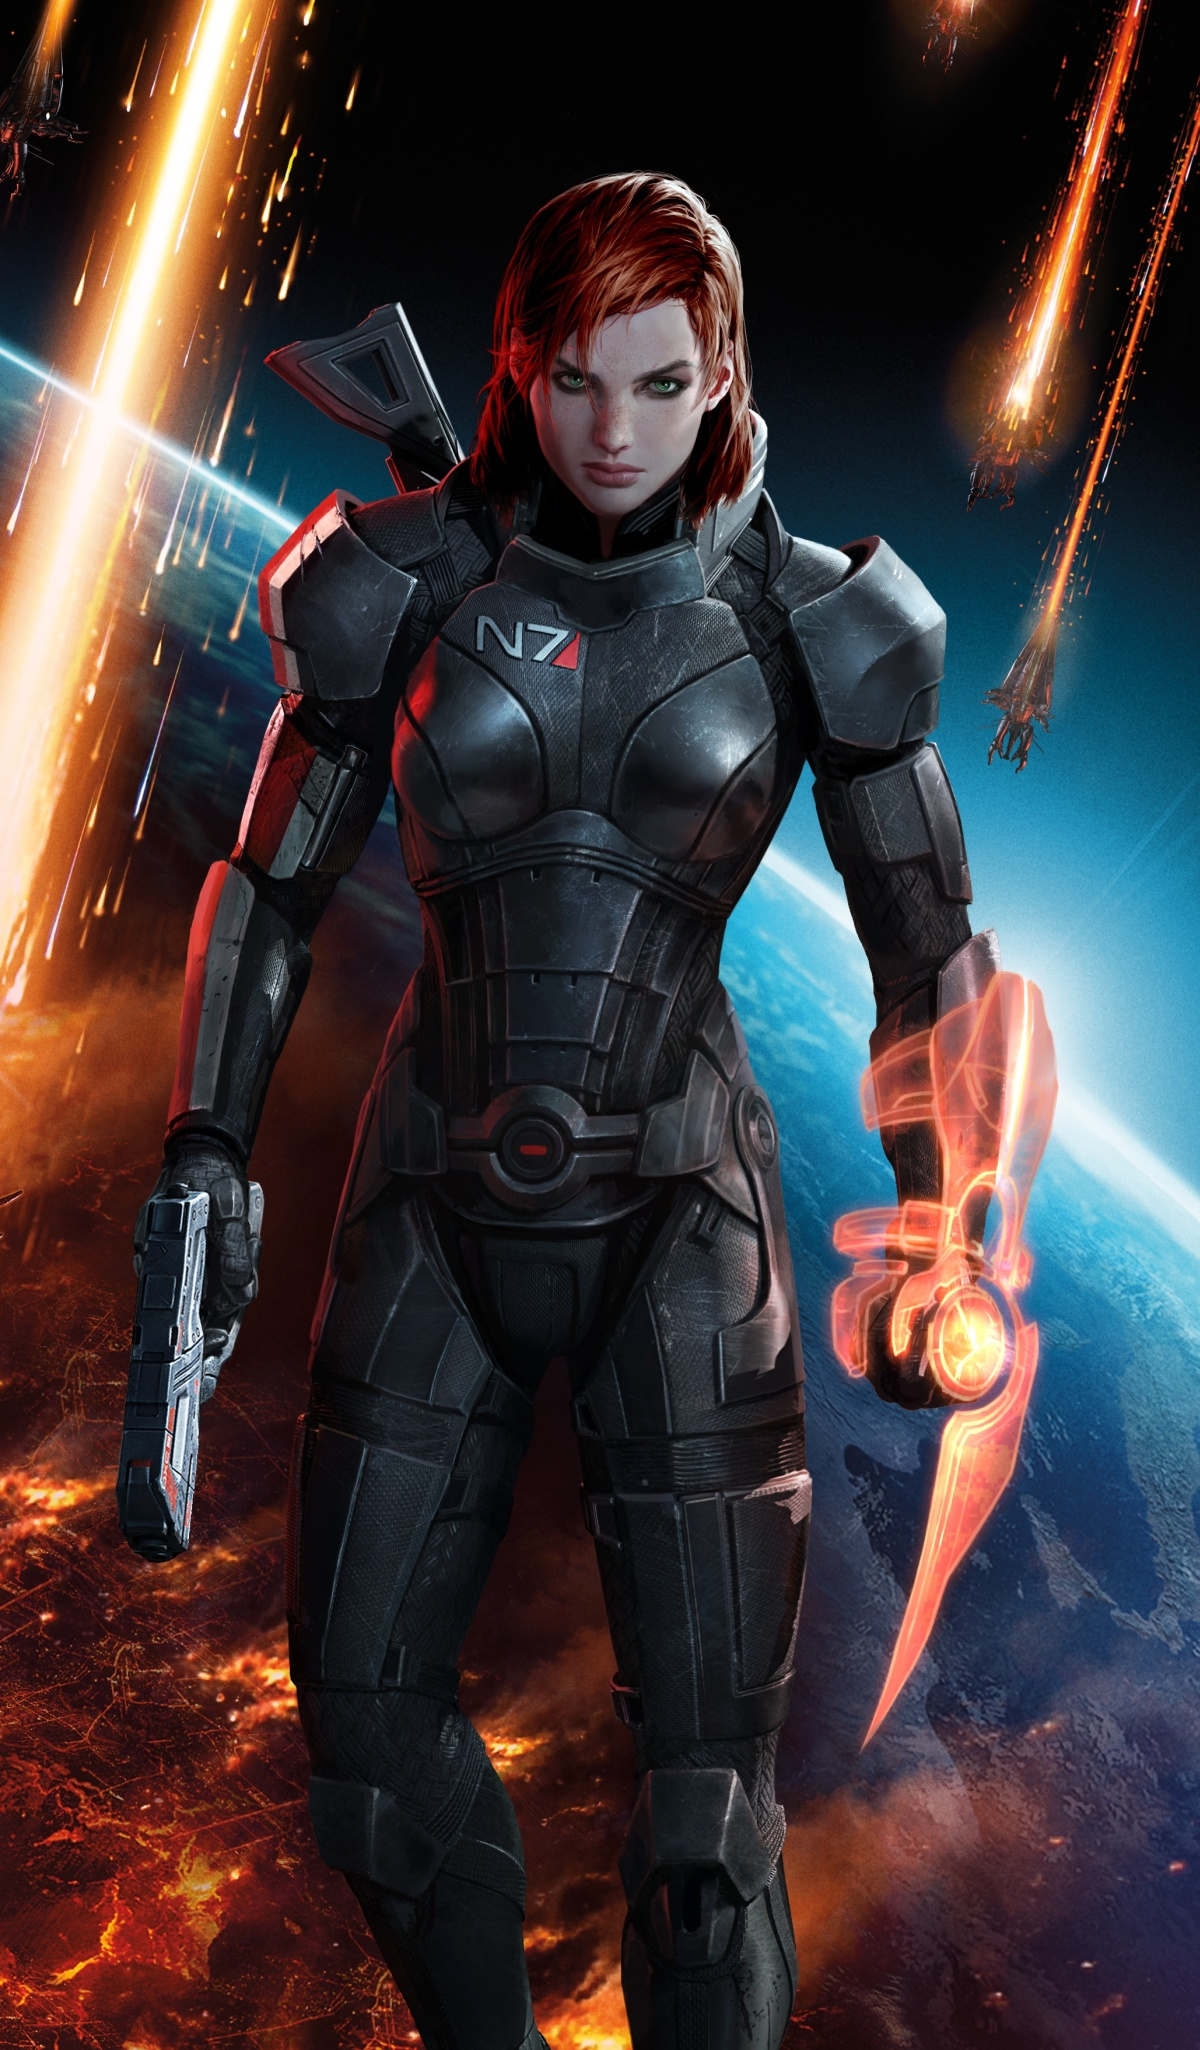 Mass-Effect-3-the-real-female-shepard.jp